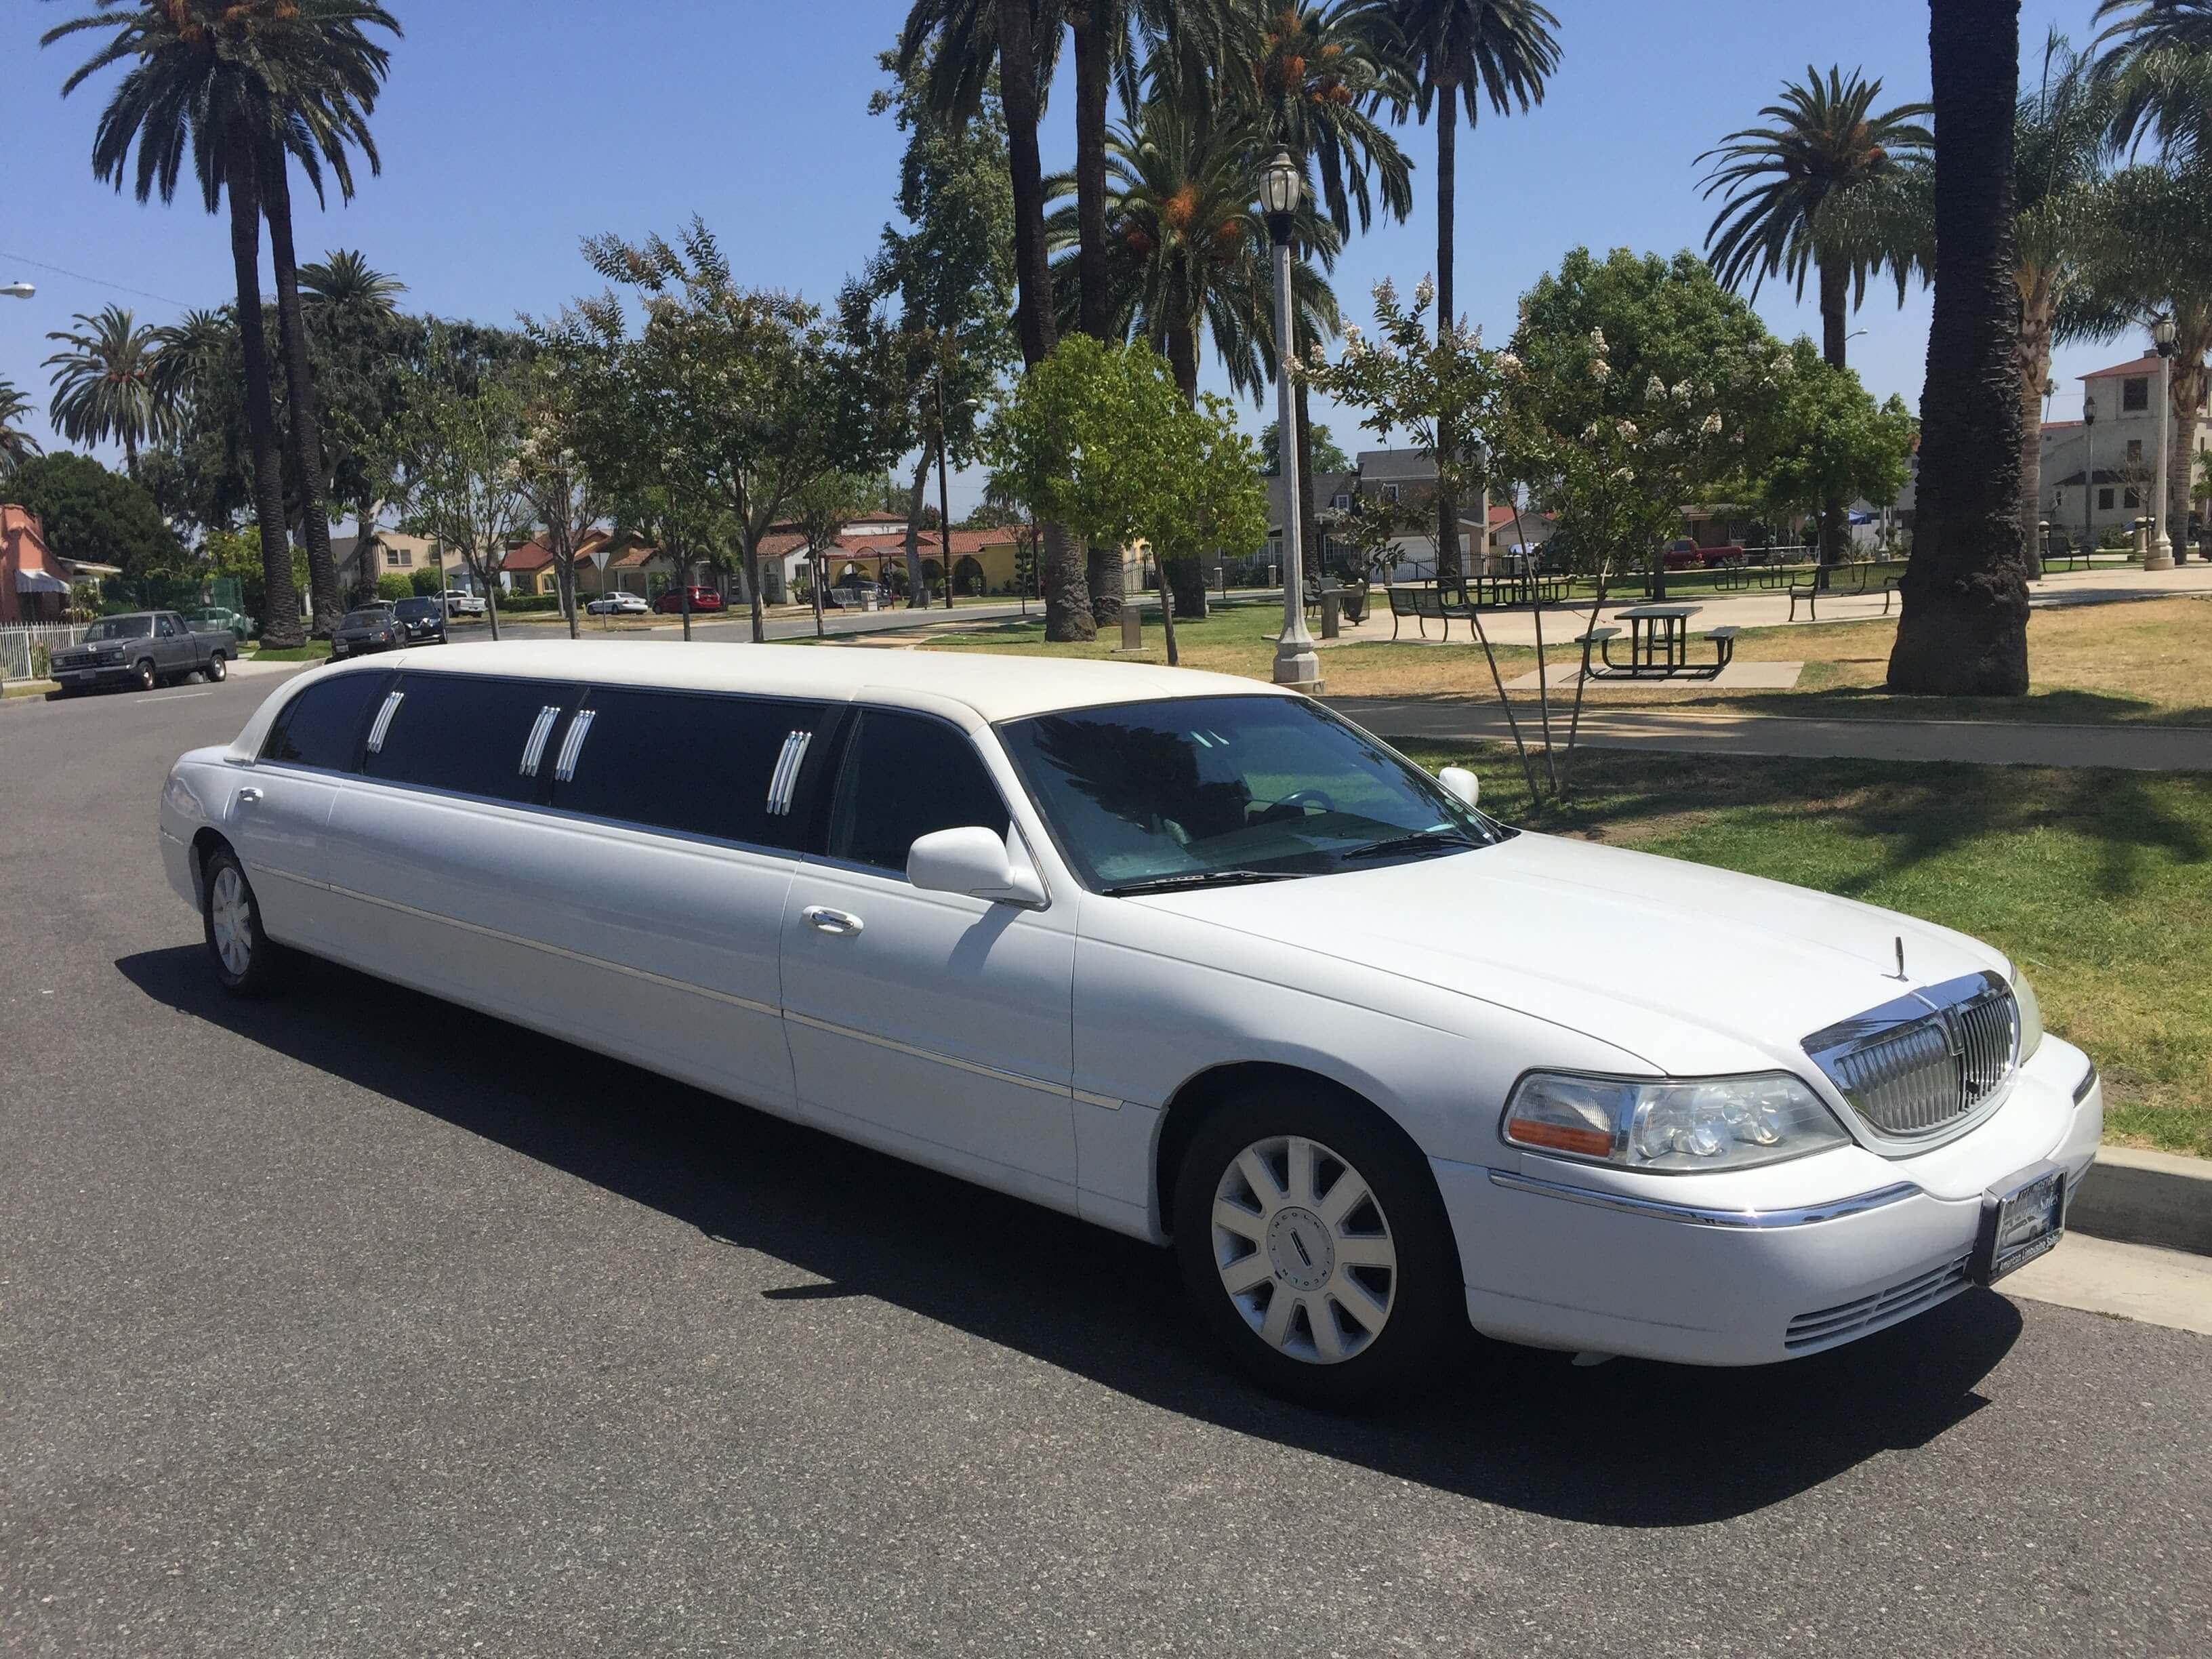 White 120 inch Lincoln TownCar Limousine